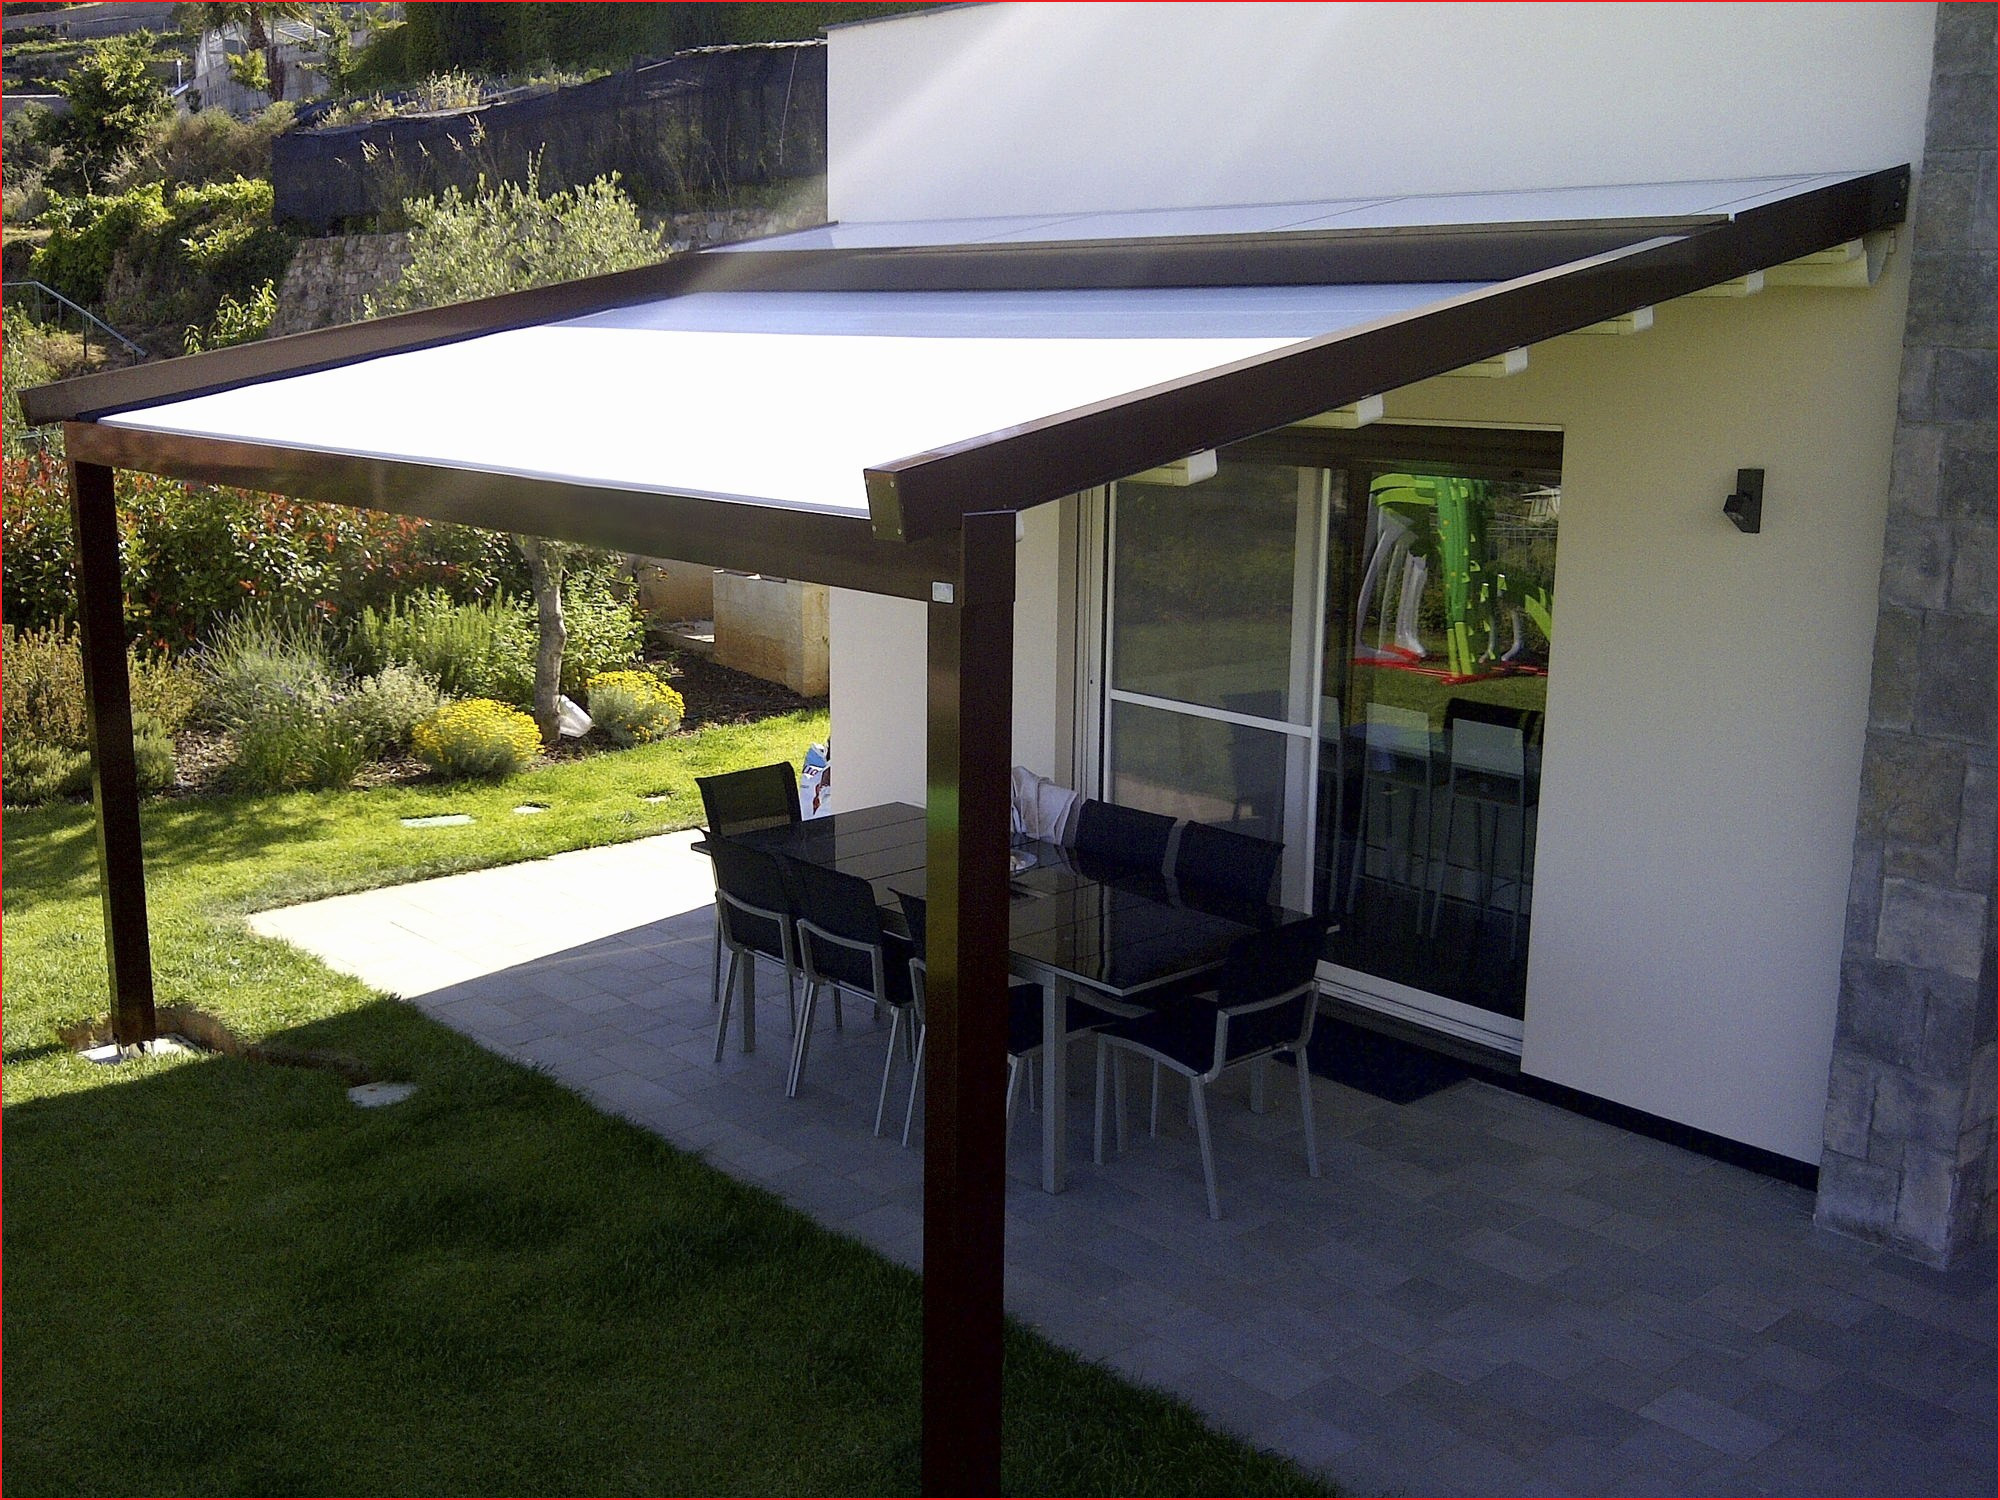 Meuble Veranda Génial Idées Pour Toile Veranda Collection De Veranda Conception | Salon Jardin